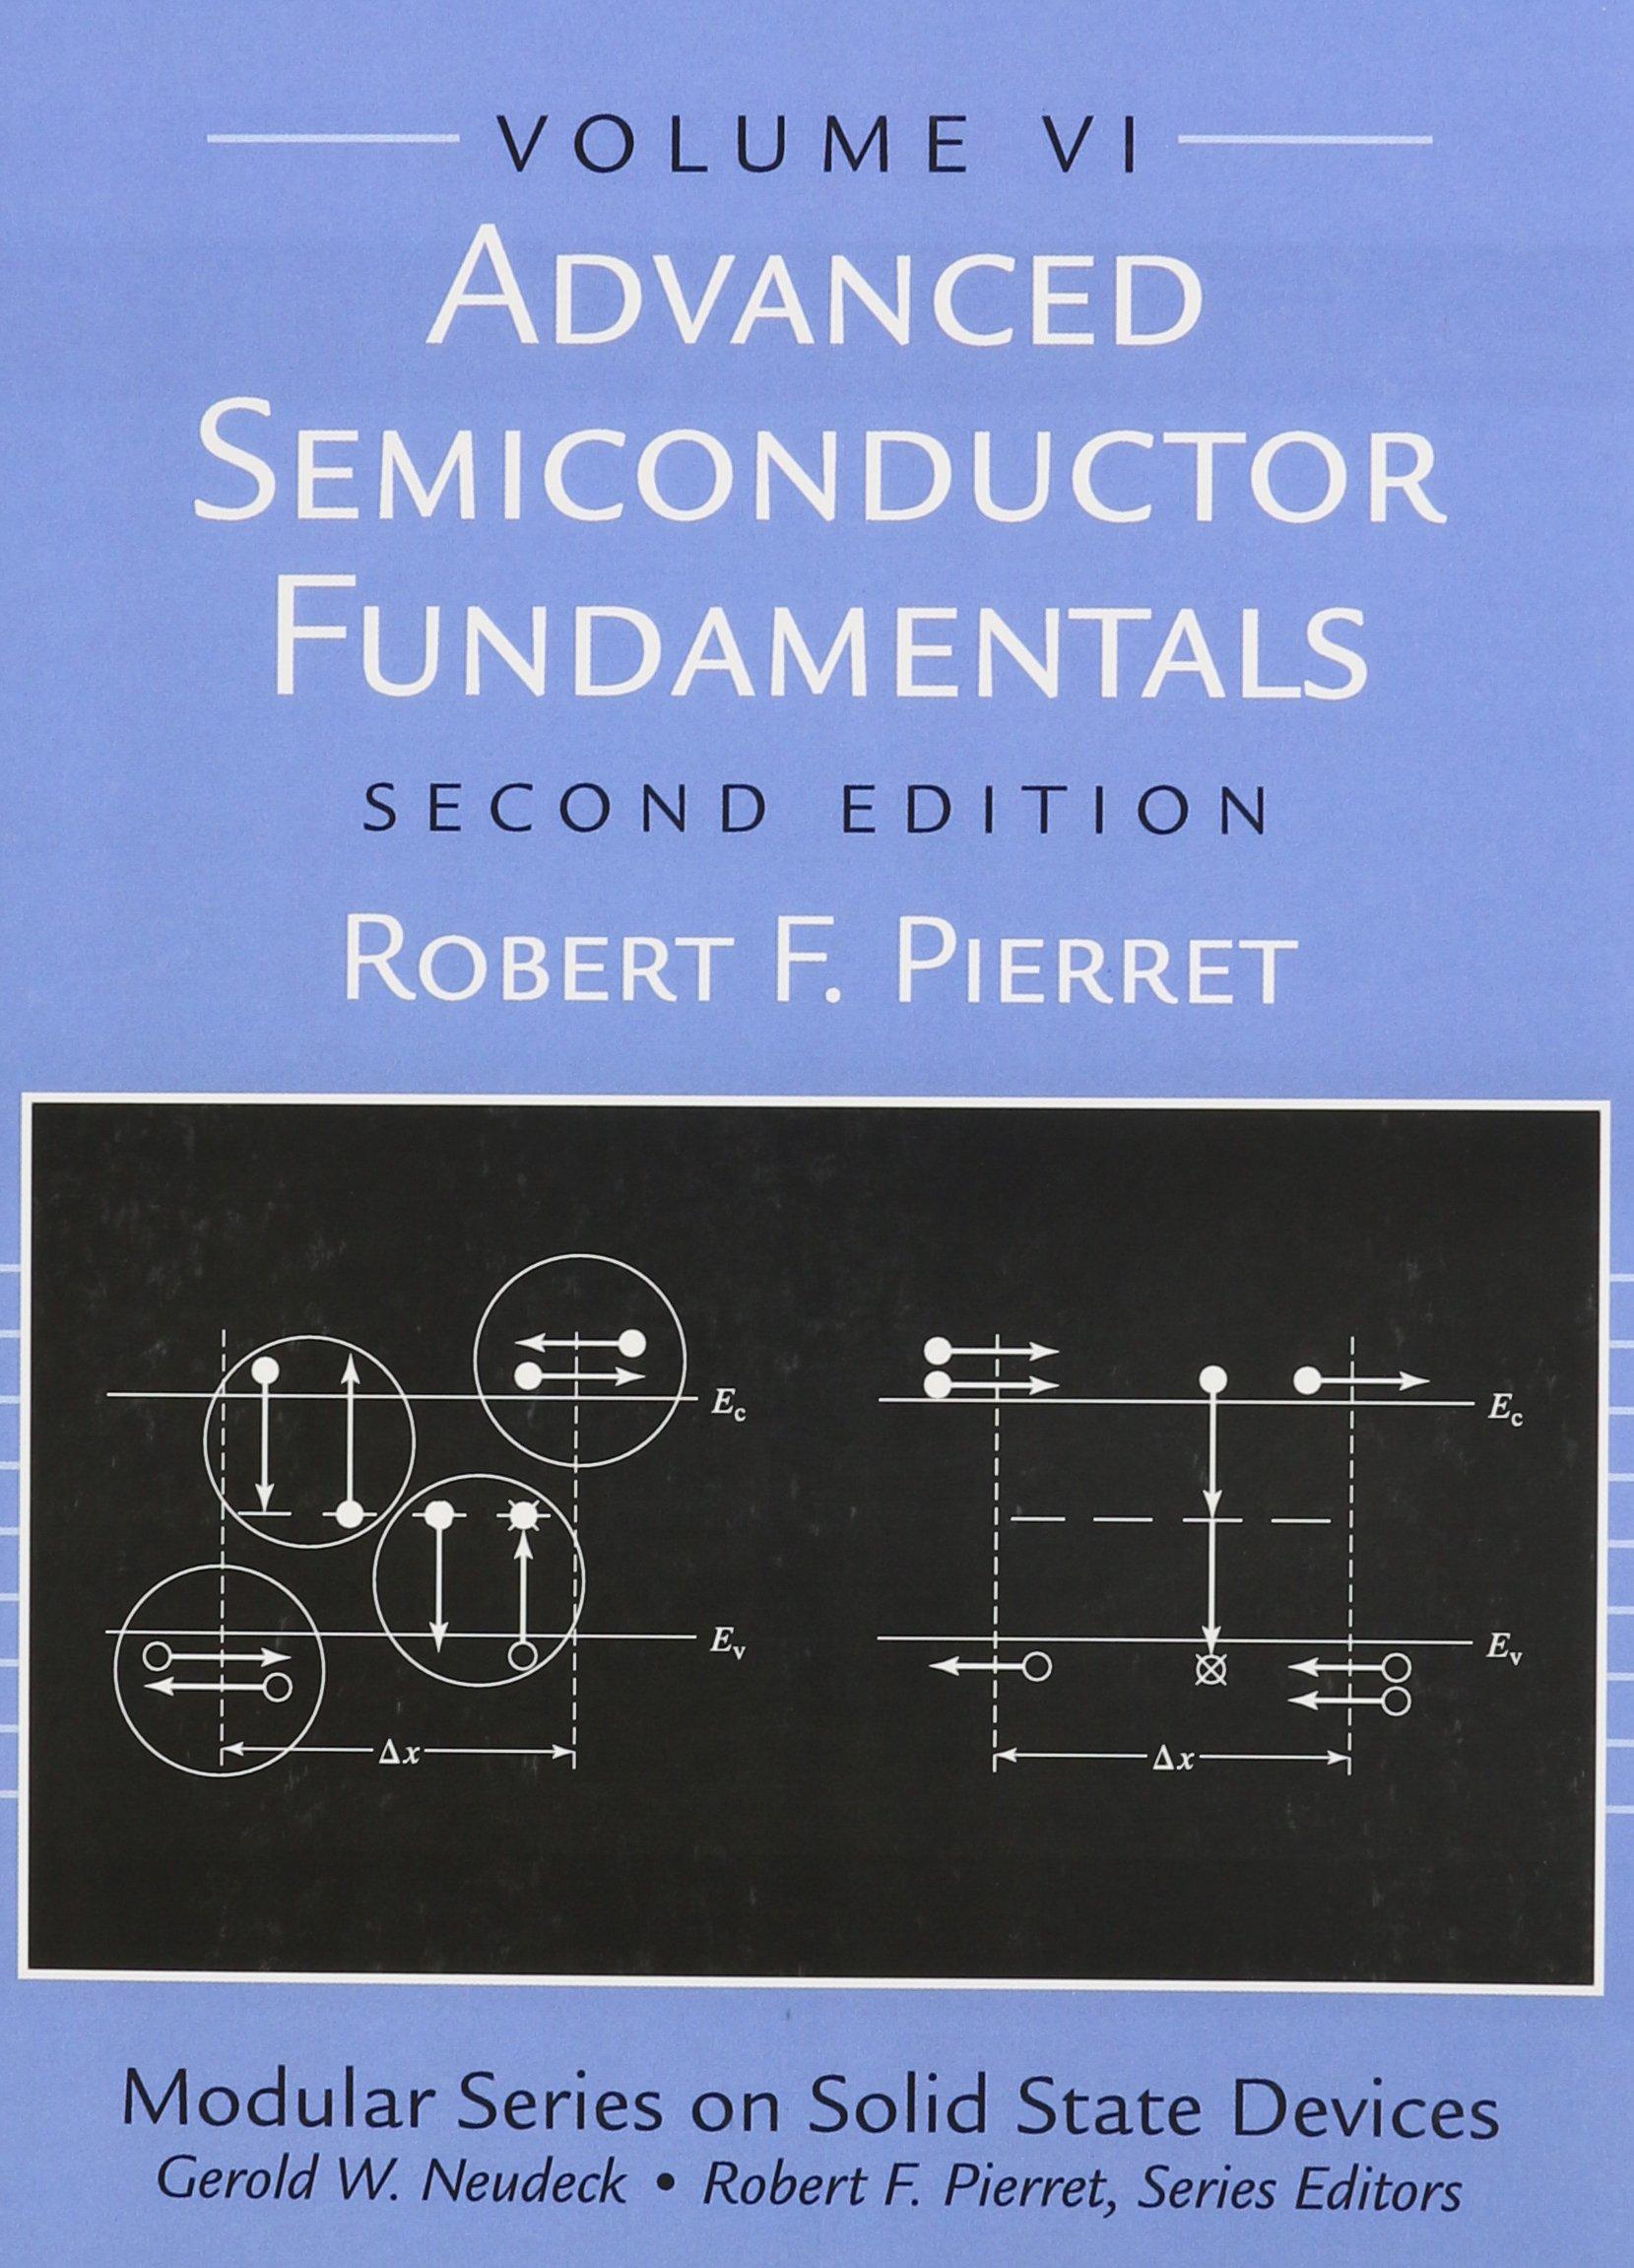 Advanced Semiconductor Fundamentals (2nd Edition): Robert F. Pierret:  9780130617927: Books - Amazon.ca